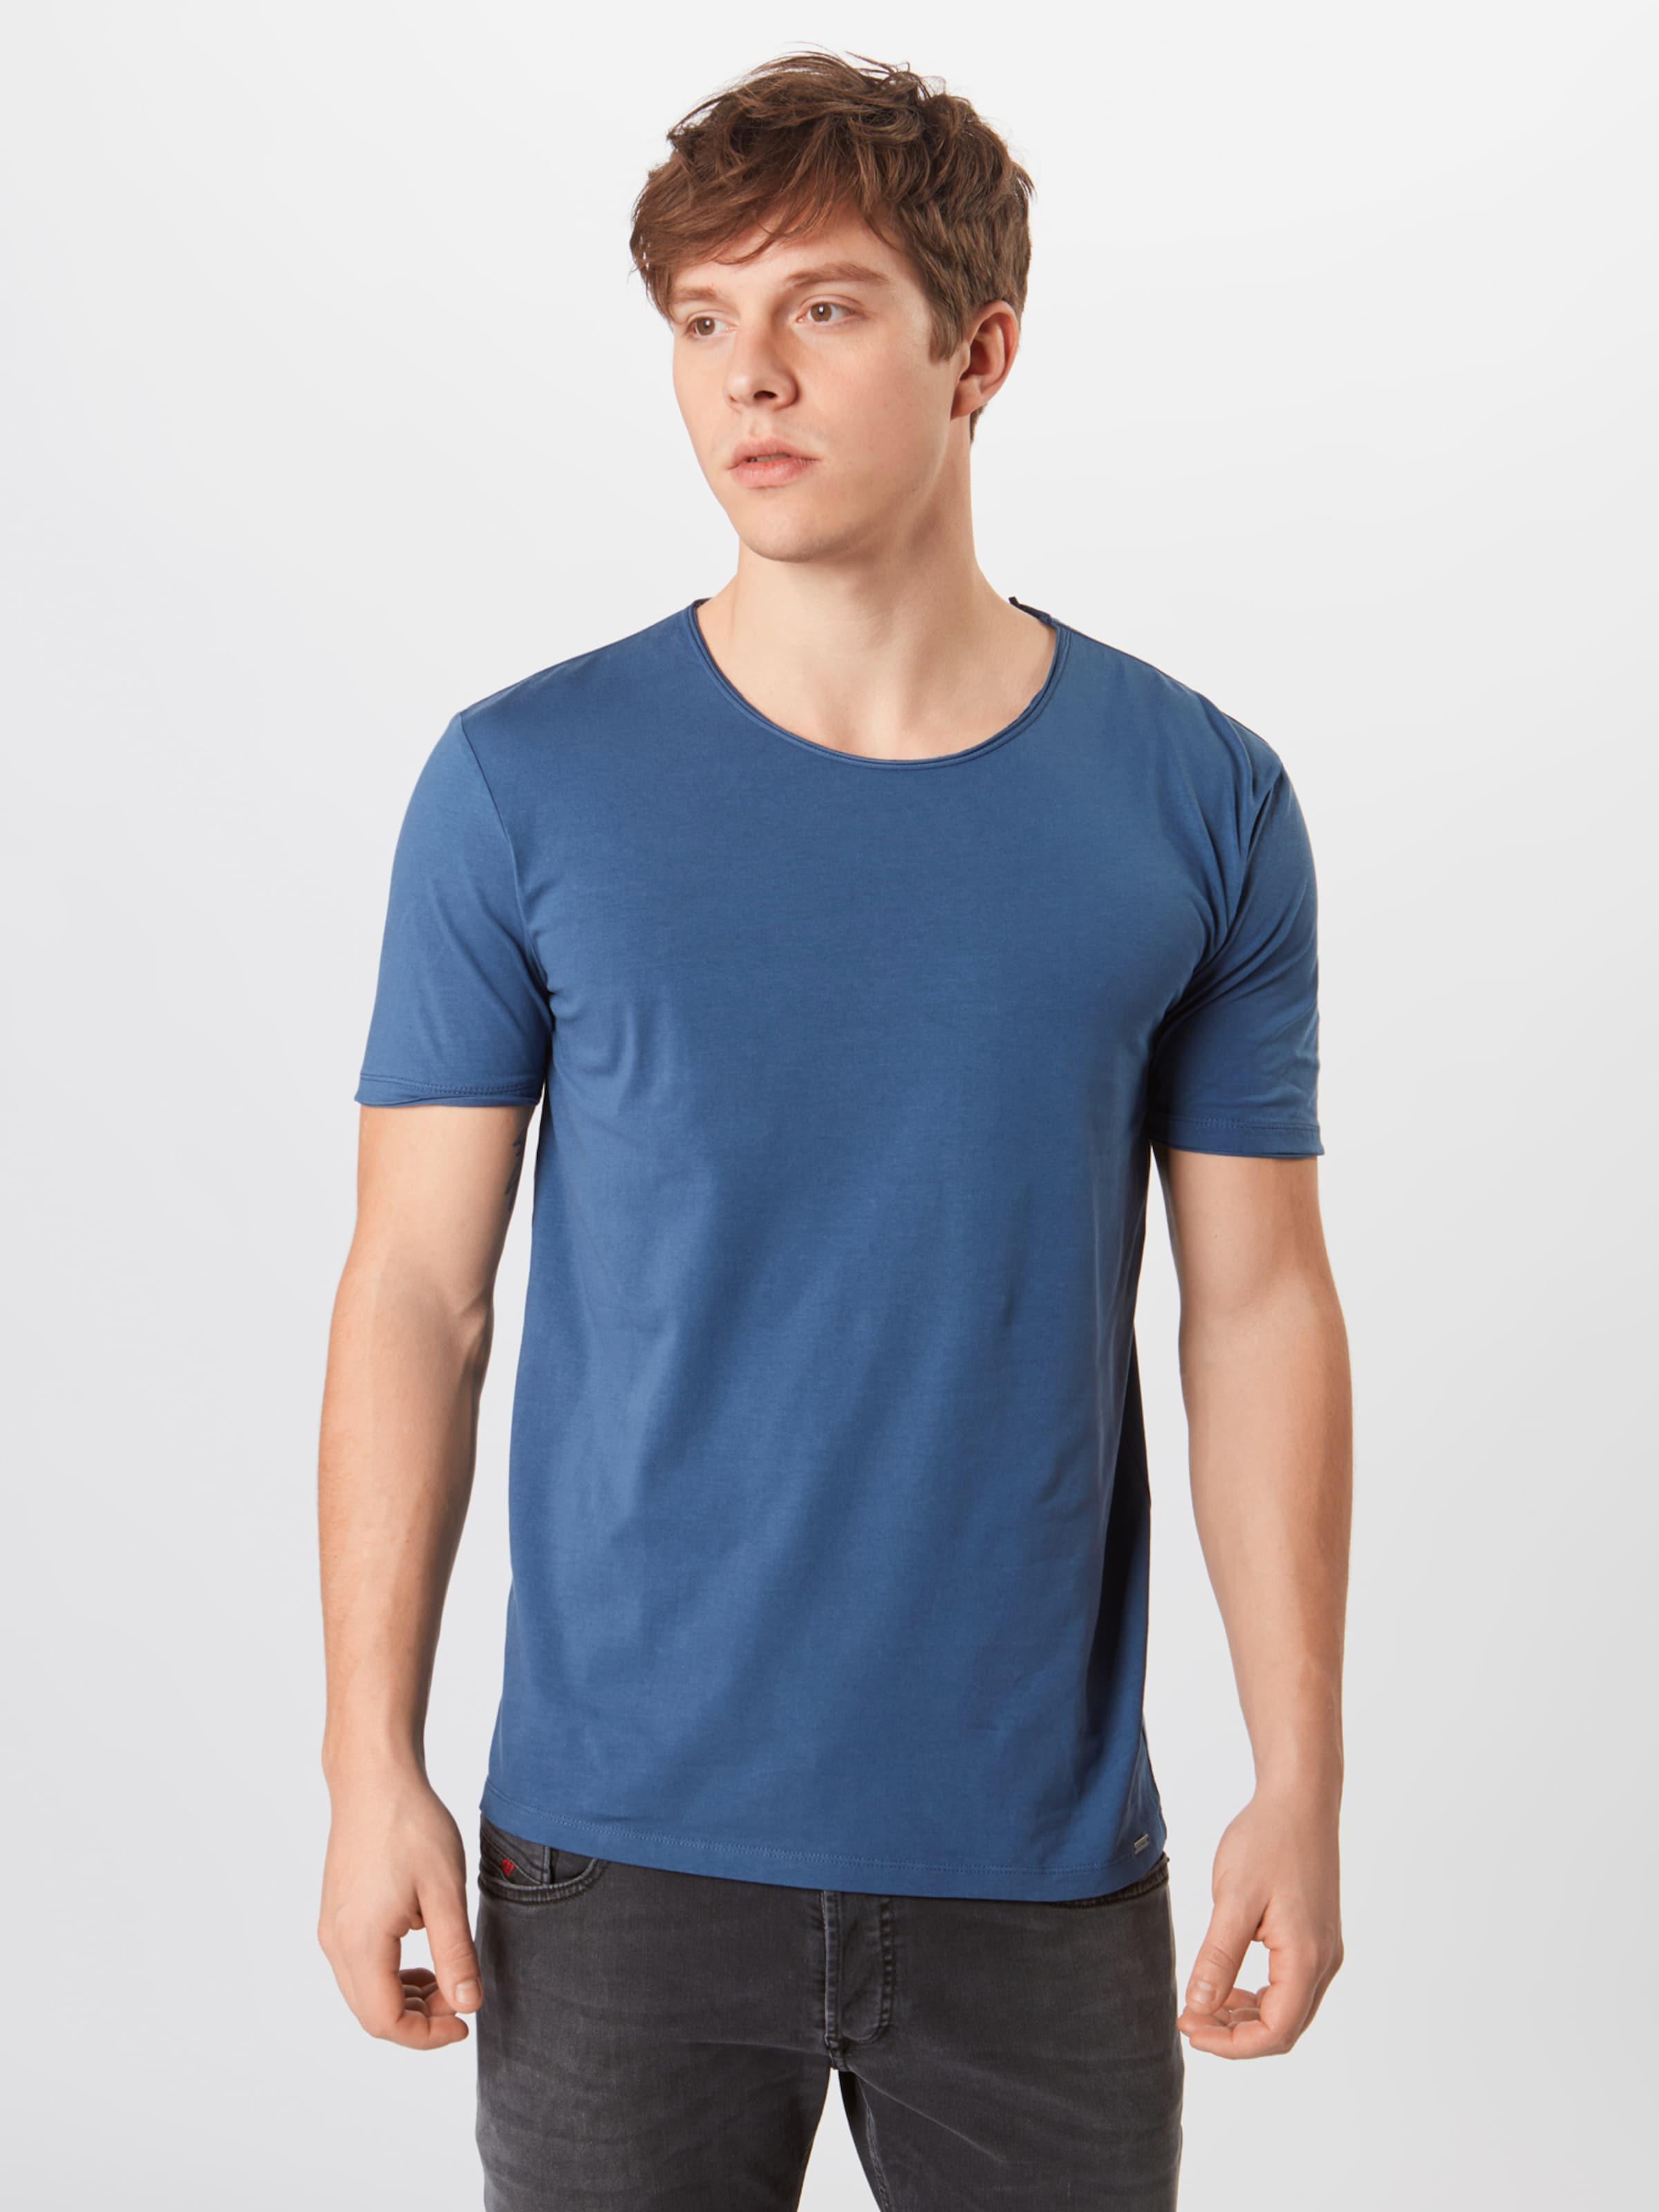 Olymp Shirt Shirt In Olymp Indigo In DIH92E